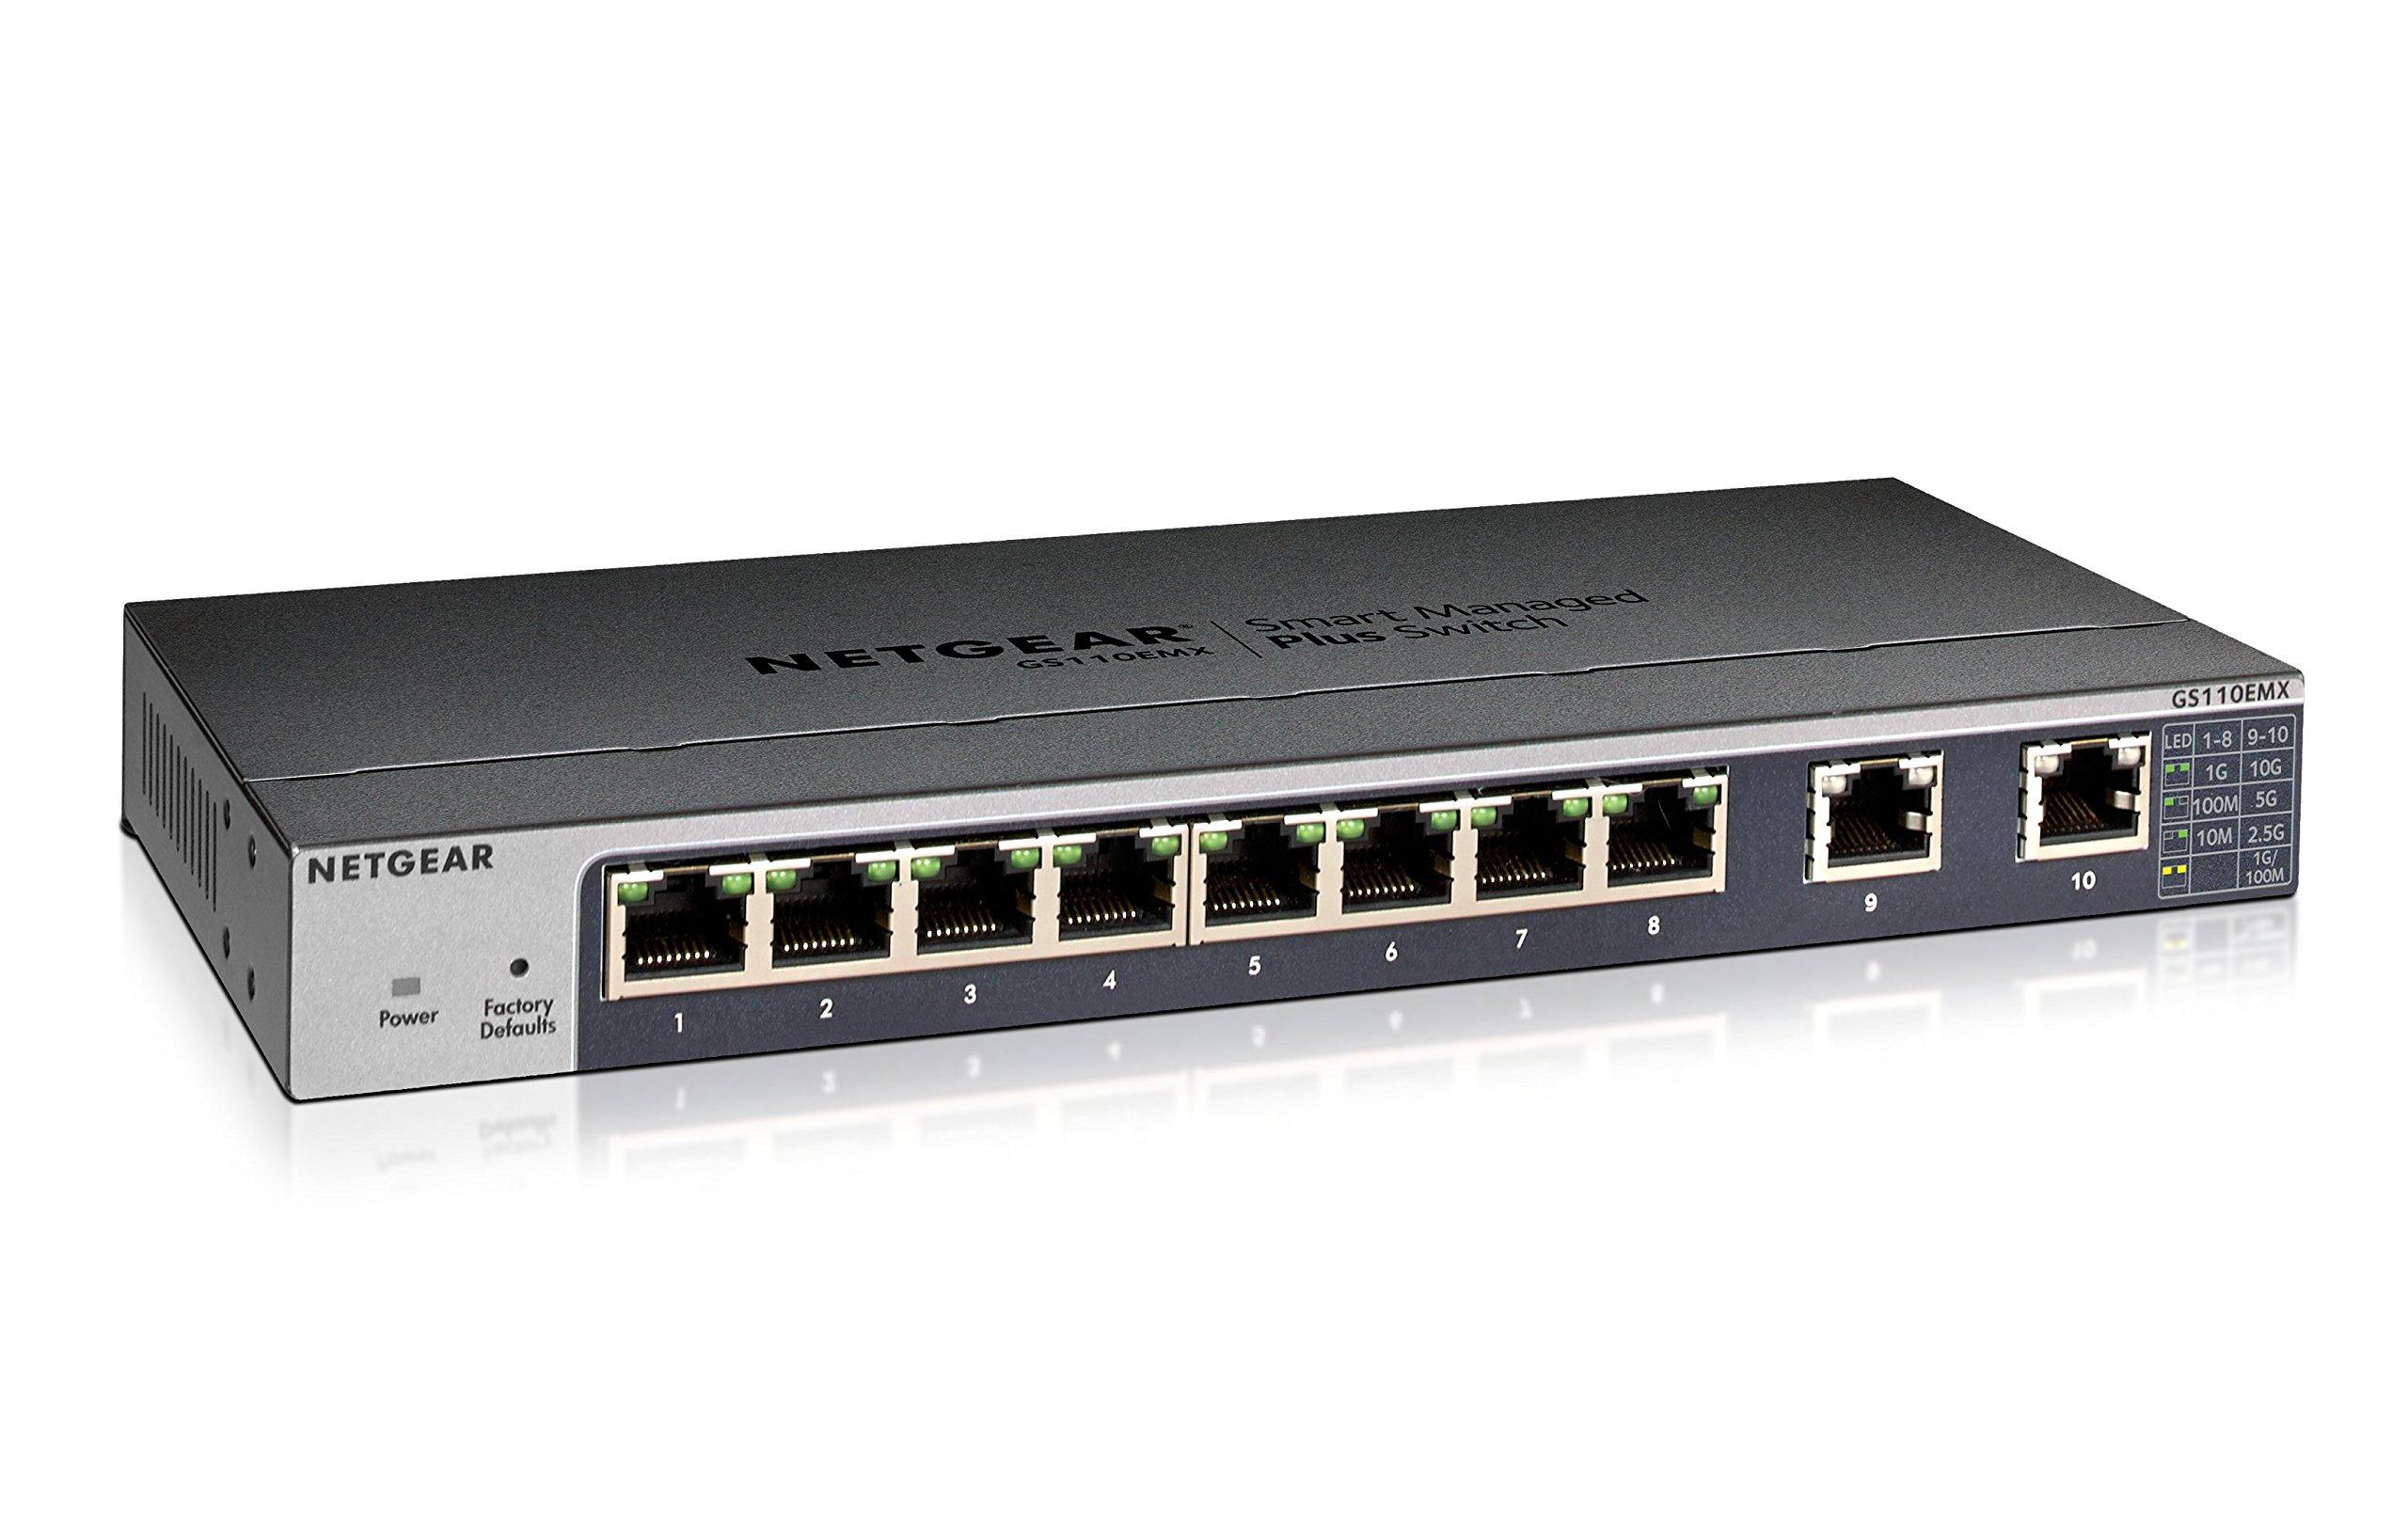 Netgear 8-port Gigabit Smart Managed Plus Switch with 2-Port 10-Gigabit/Multi-Gigabit (GS110EMX-100NAS)